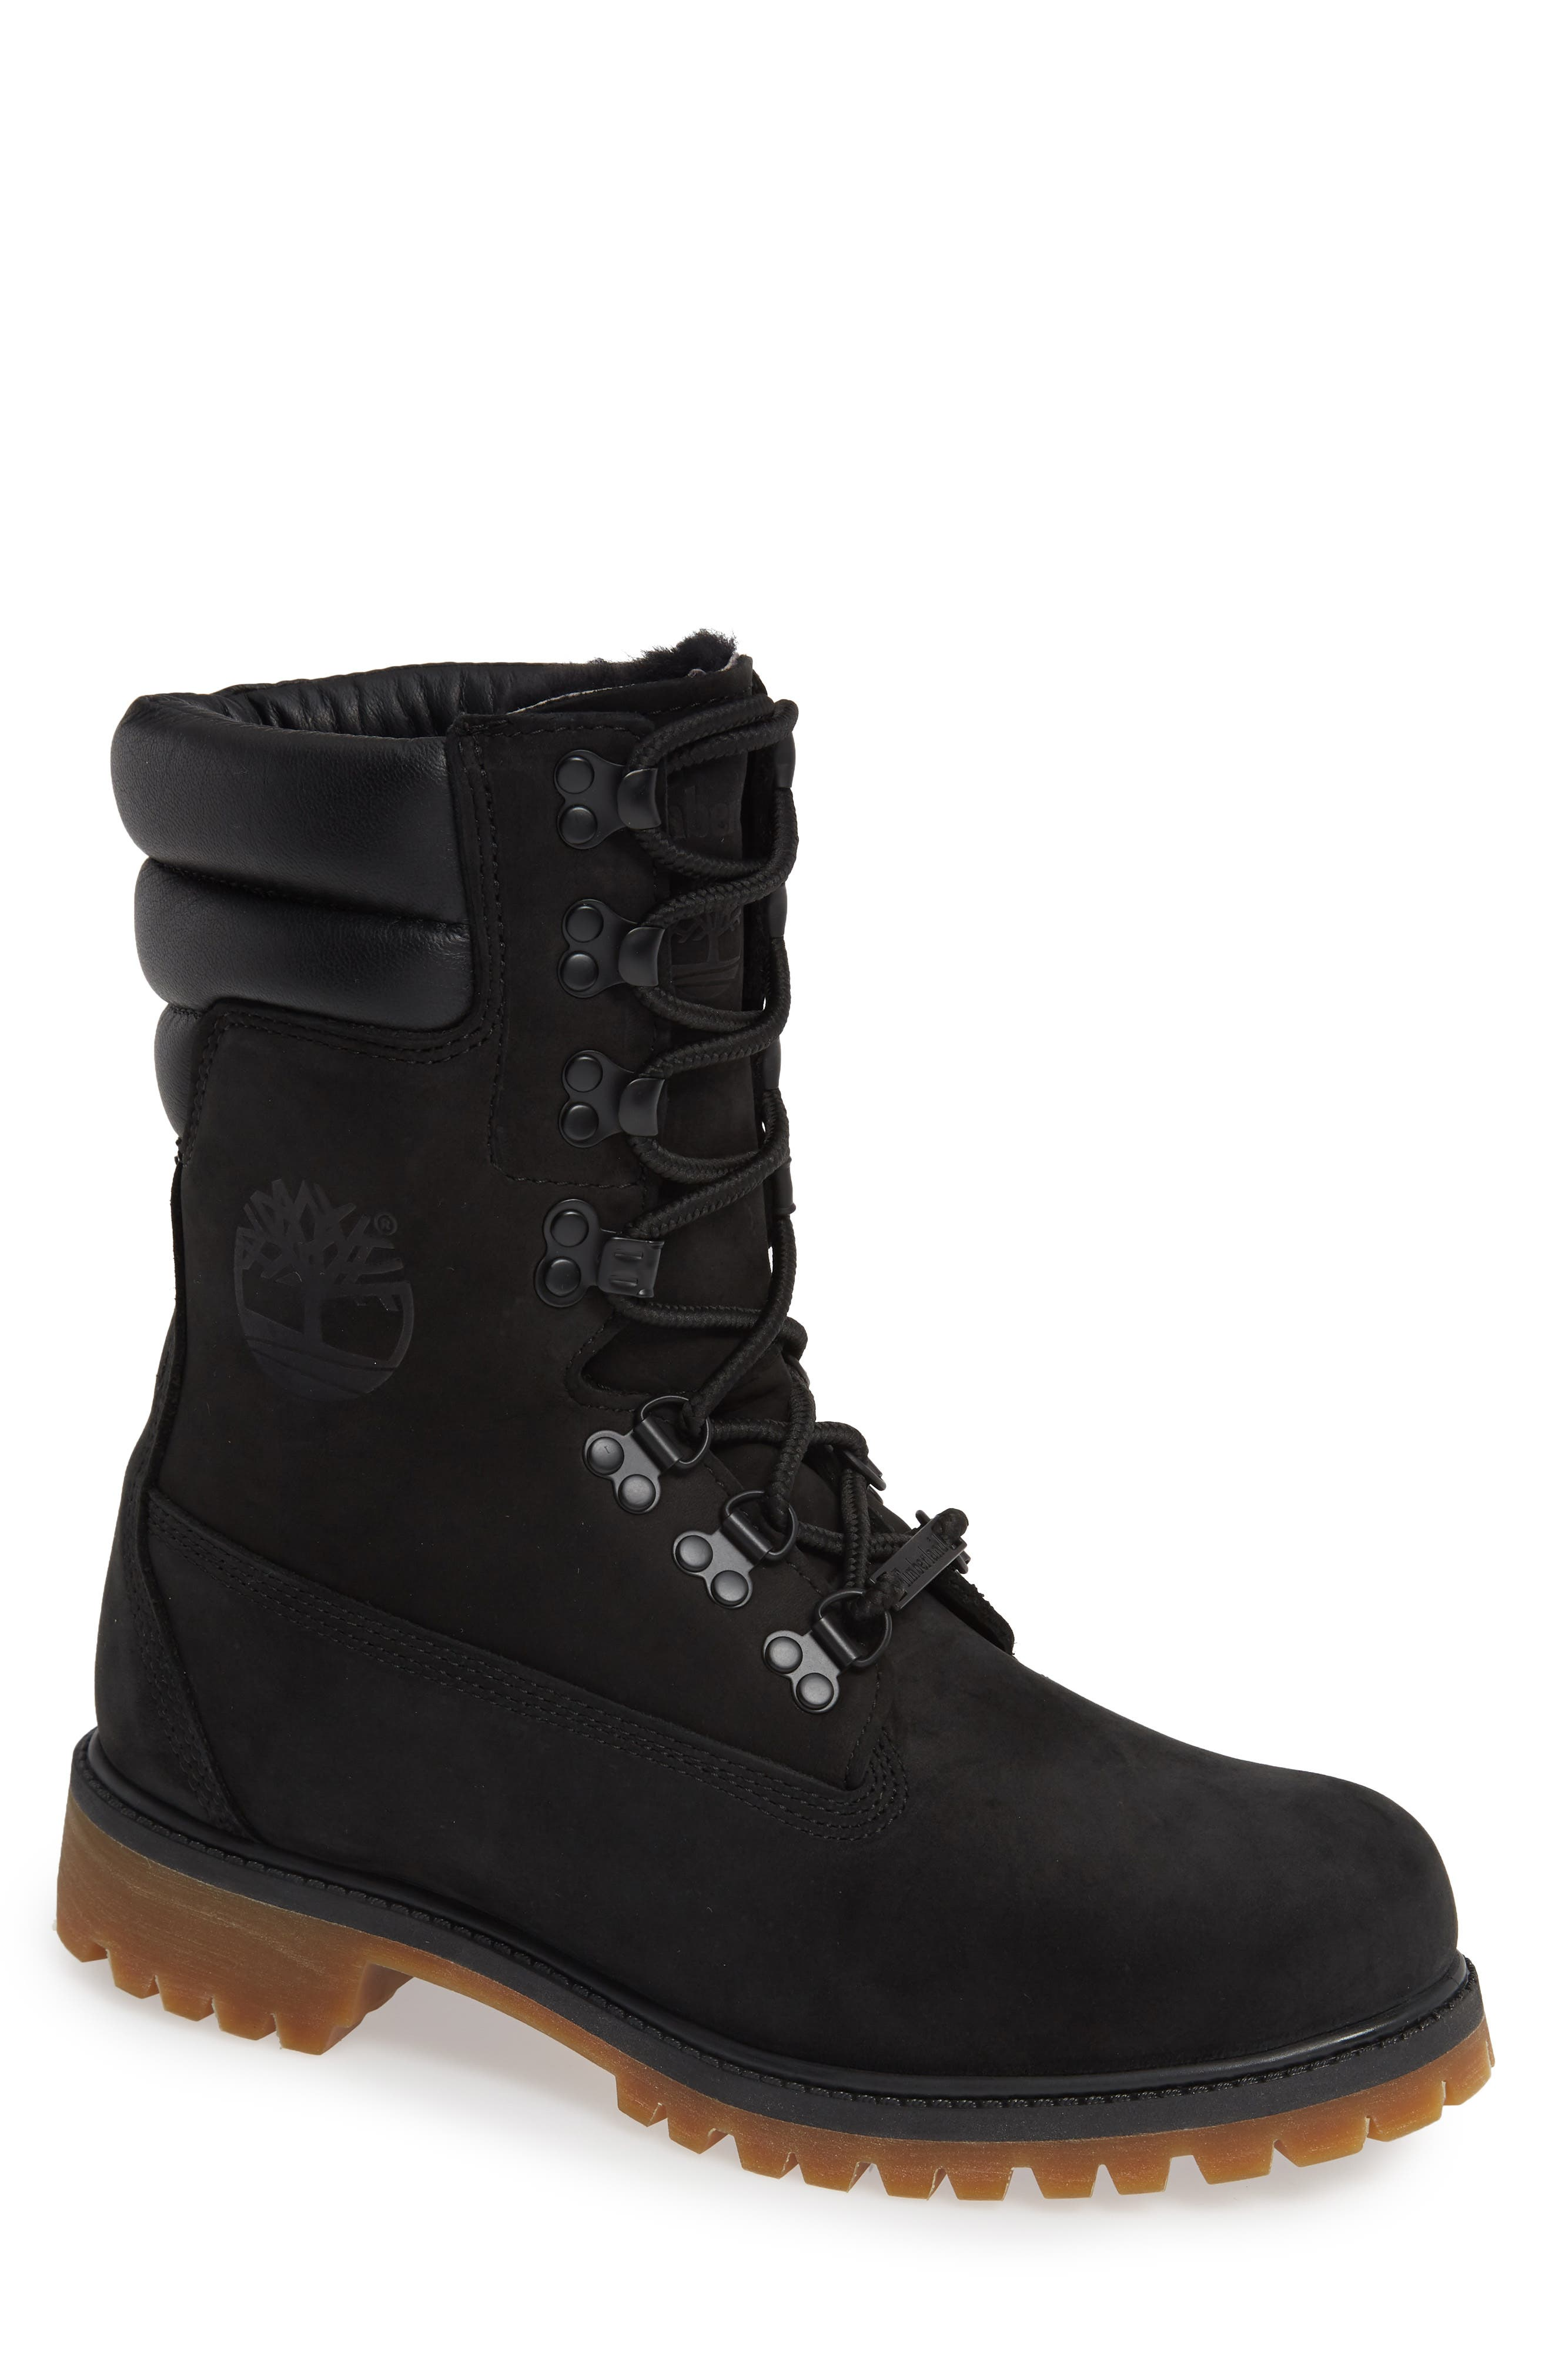 Timberland Level 0 Super Boot, Black